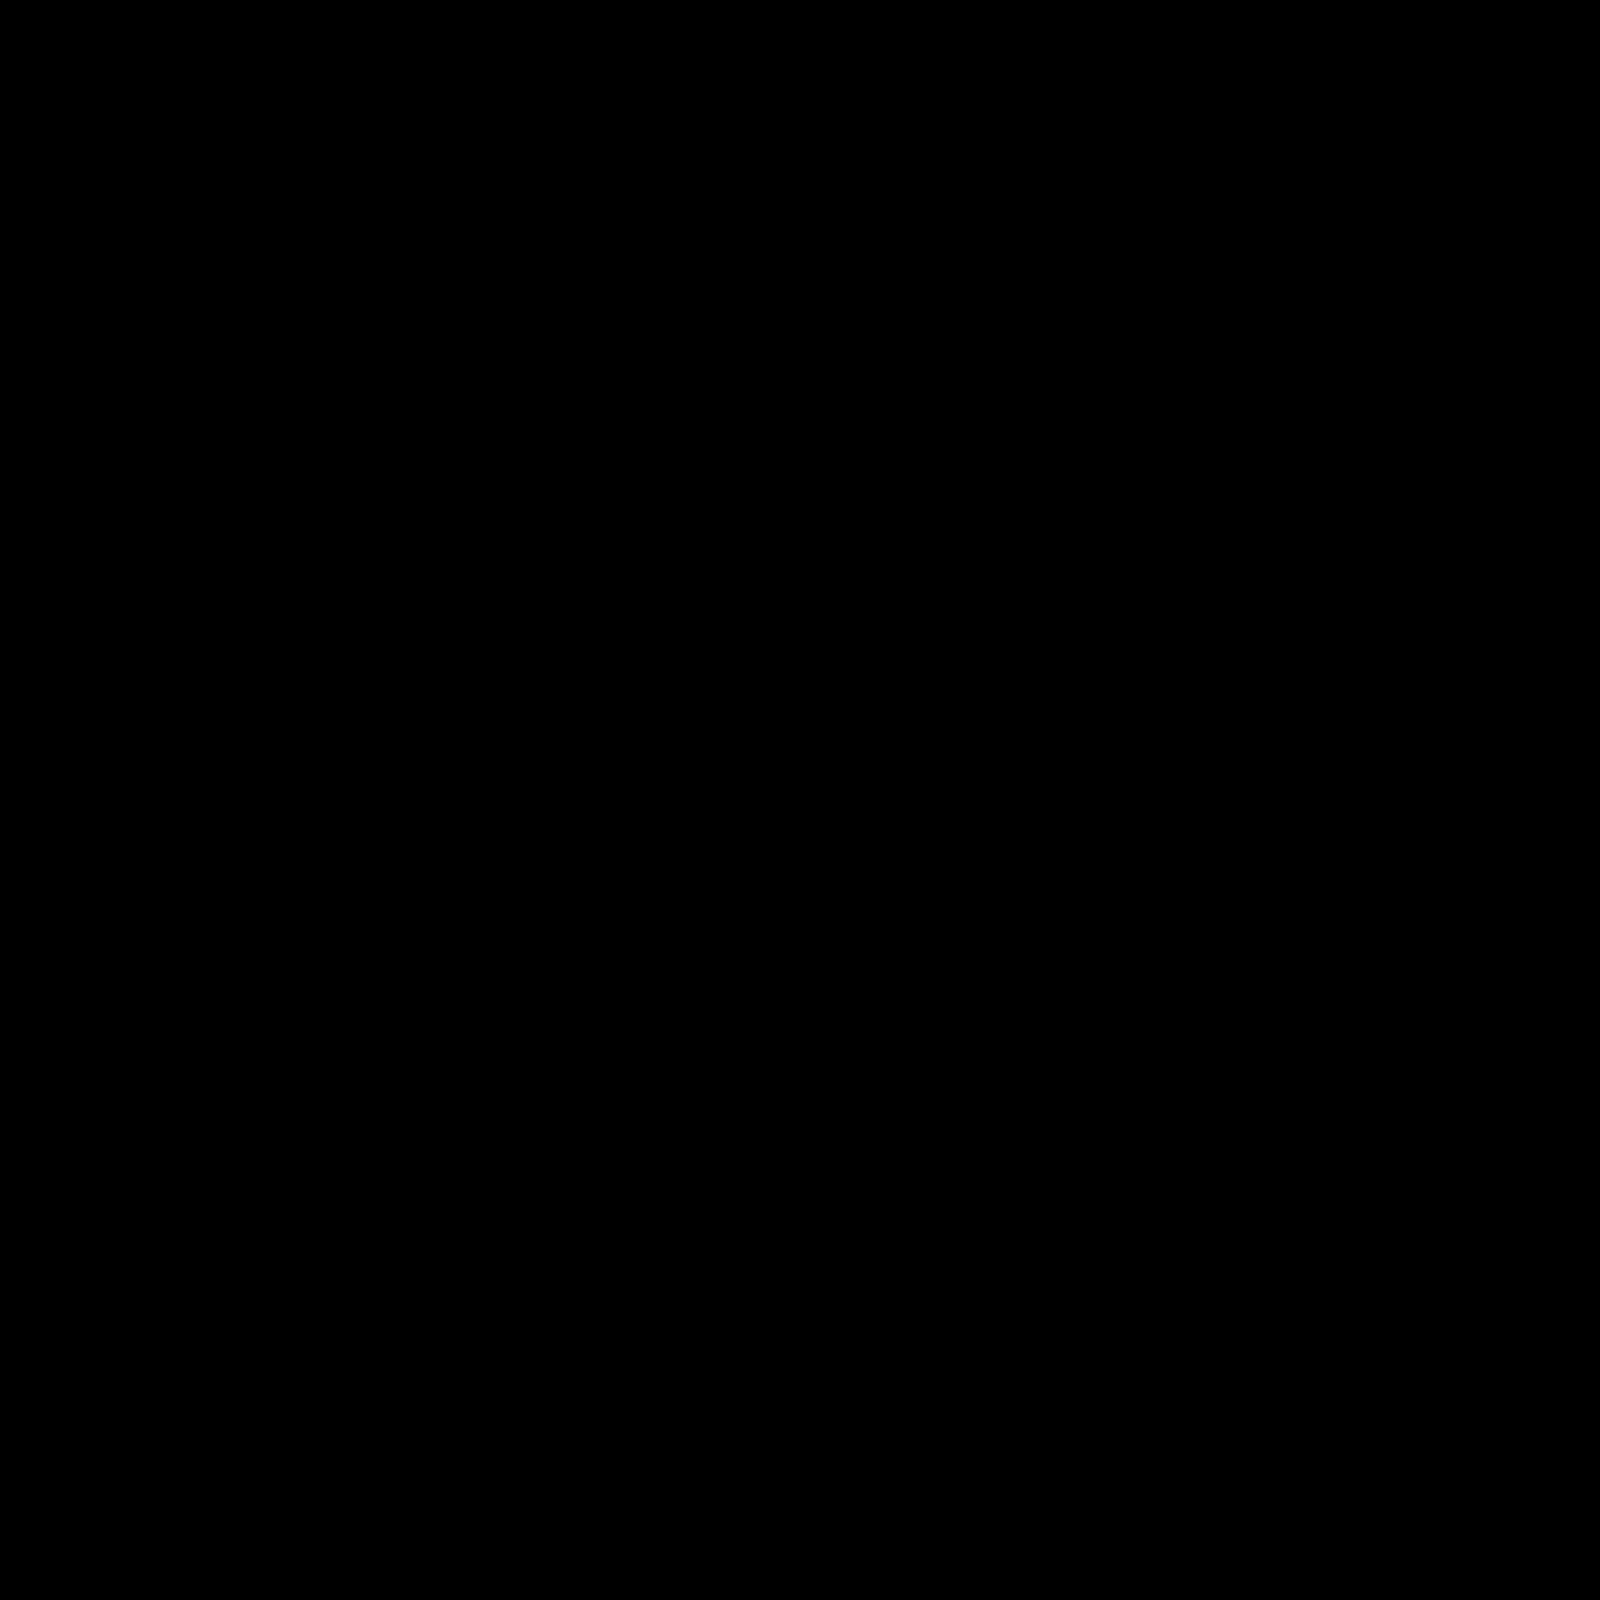 Automatic Brightness icon